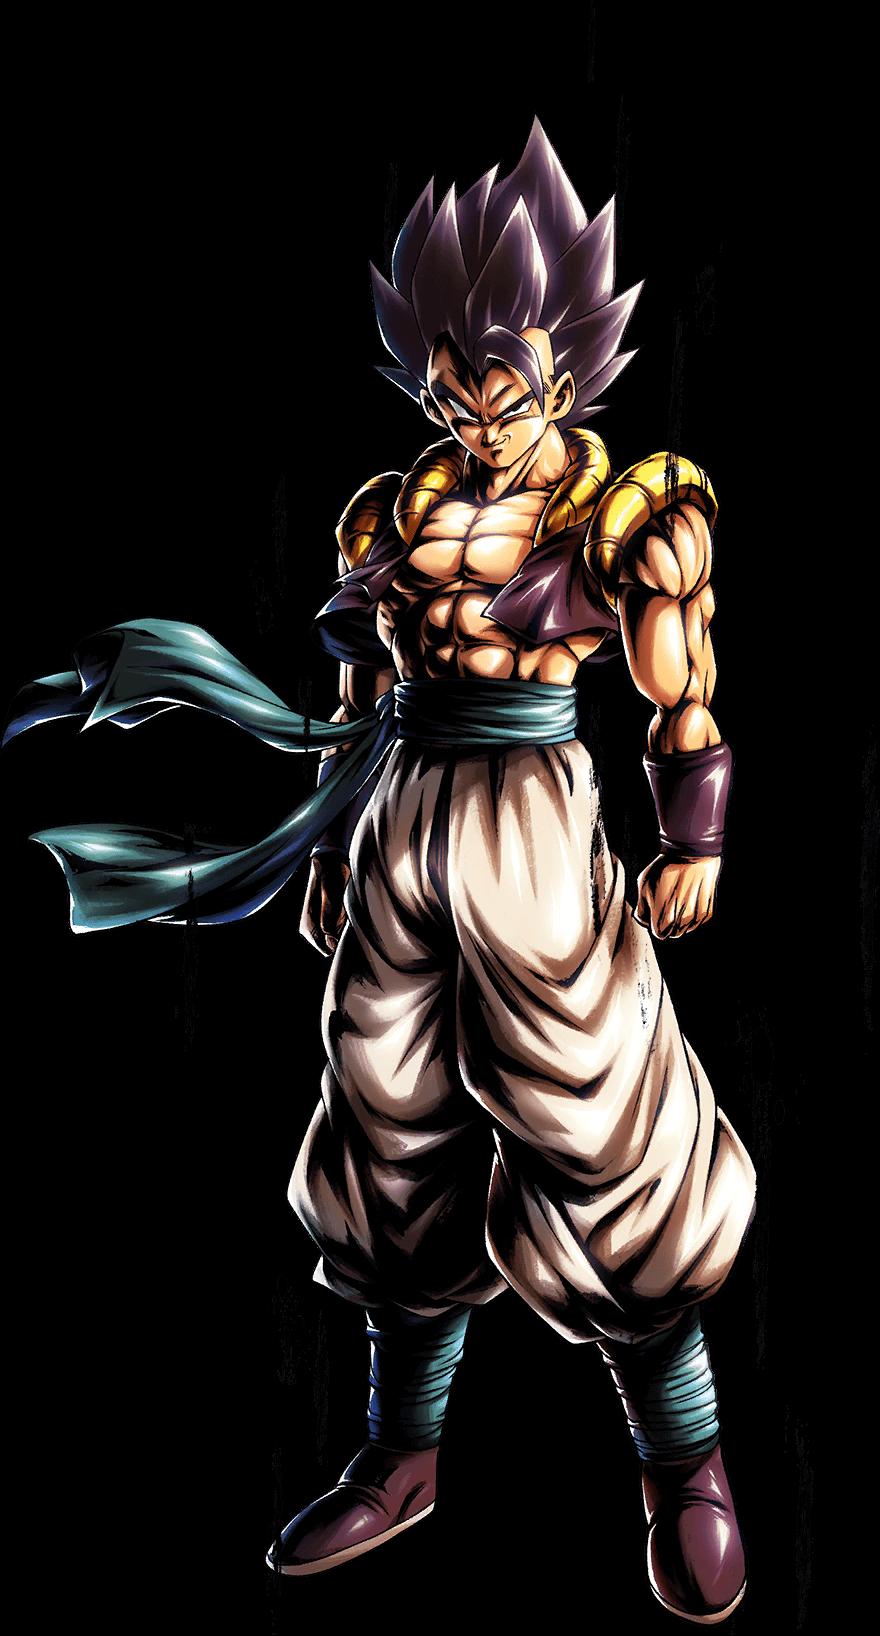 Gogeta (Dragon Ball Super) | VS Battles Wiki | FANDOM powered by Wikia